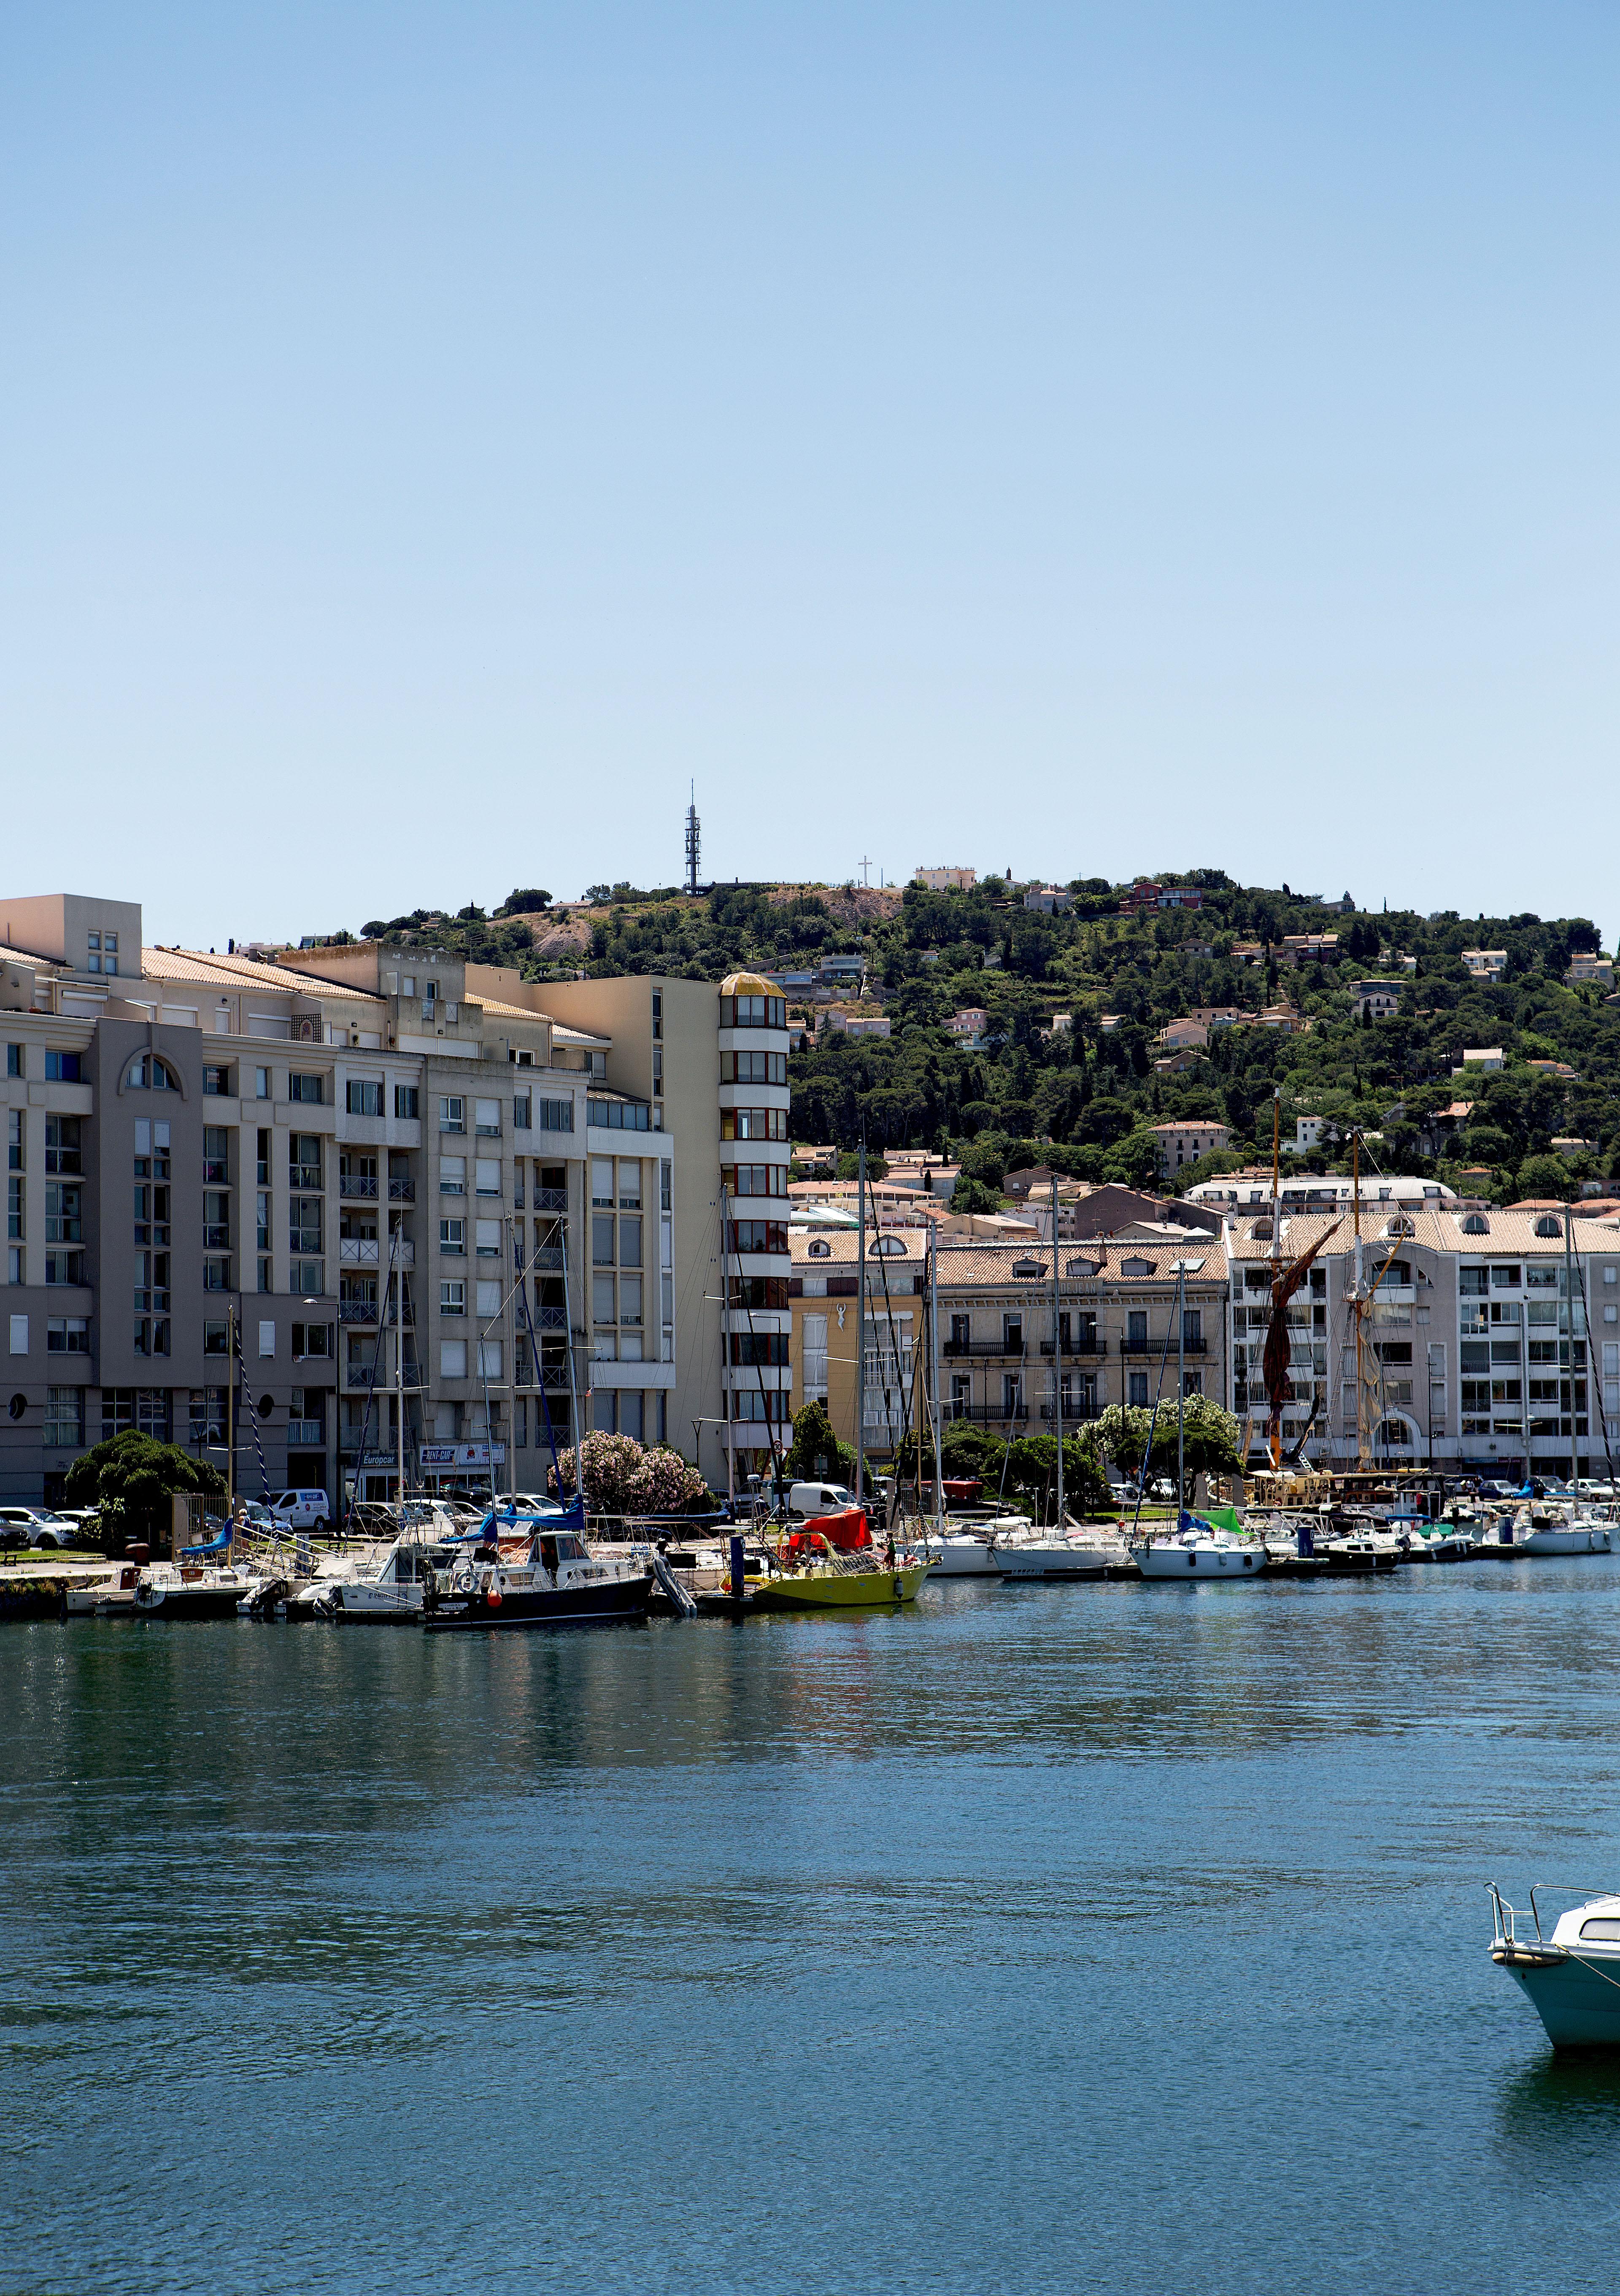 Shipsomnia Postcards - A Week Cruising Mediterranean